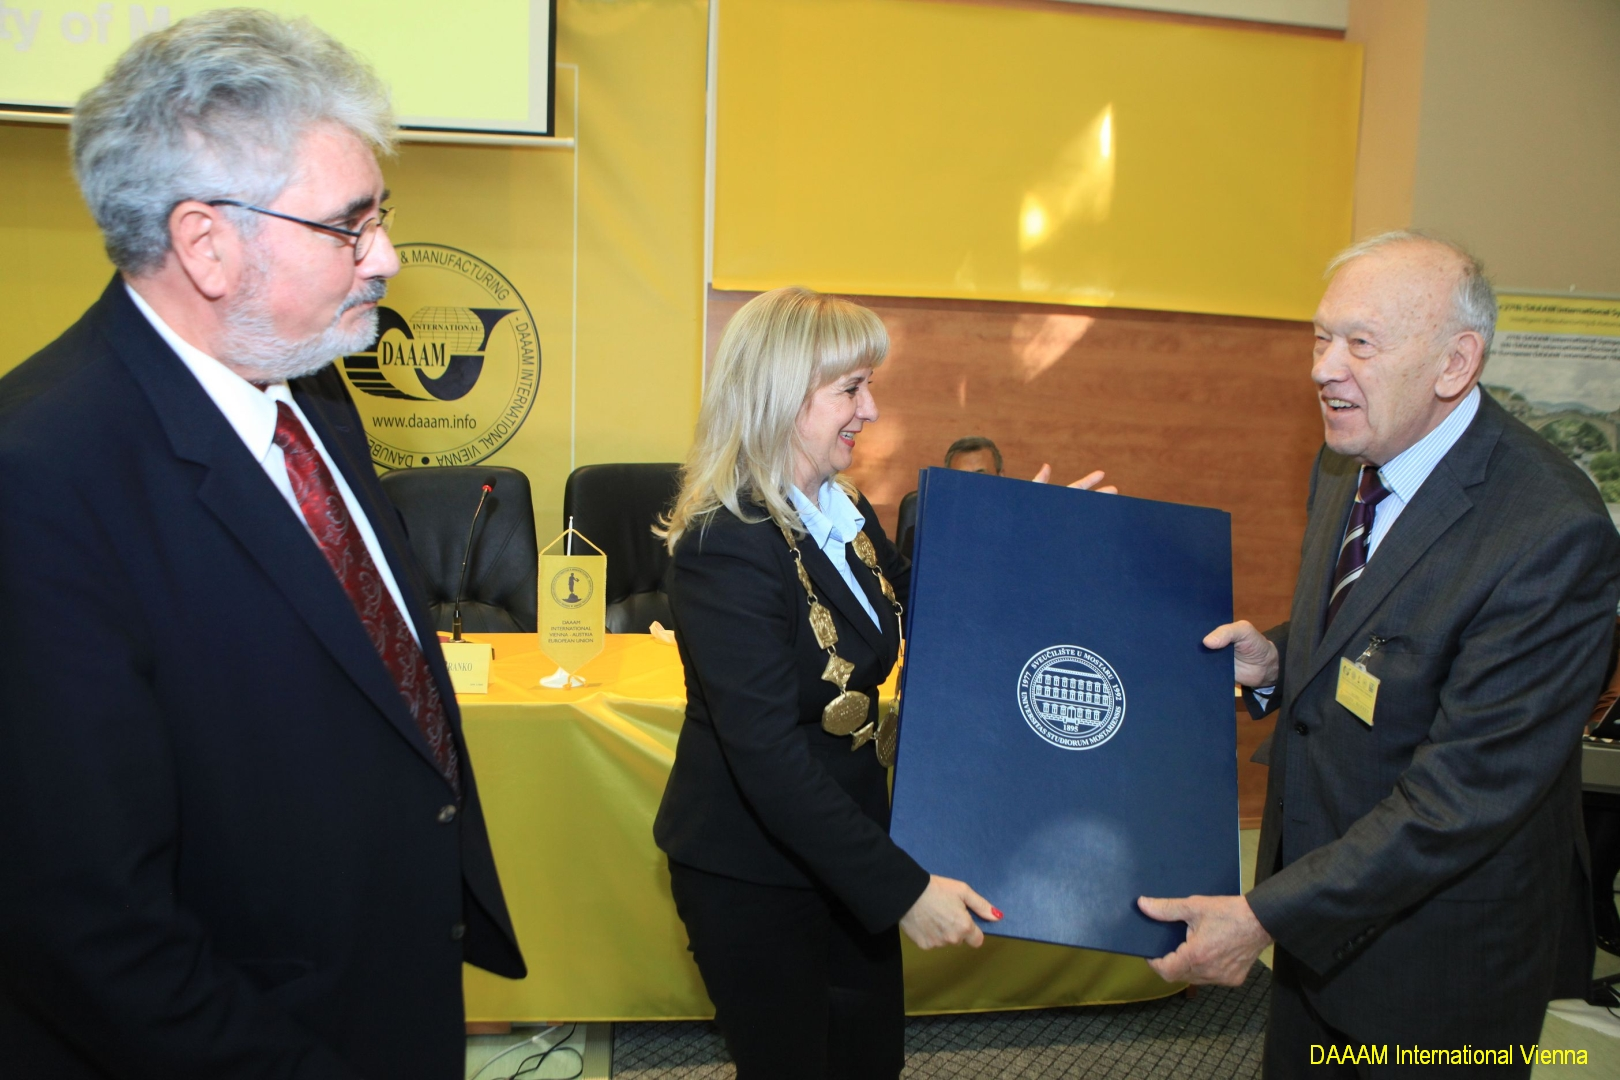 DAAAM_2016_Mostar_06_Professor_and_Cosmonaut_Alexey_Eliseev_Doctor_honors_causa_006